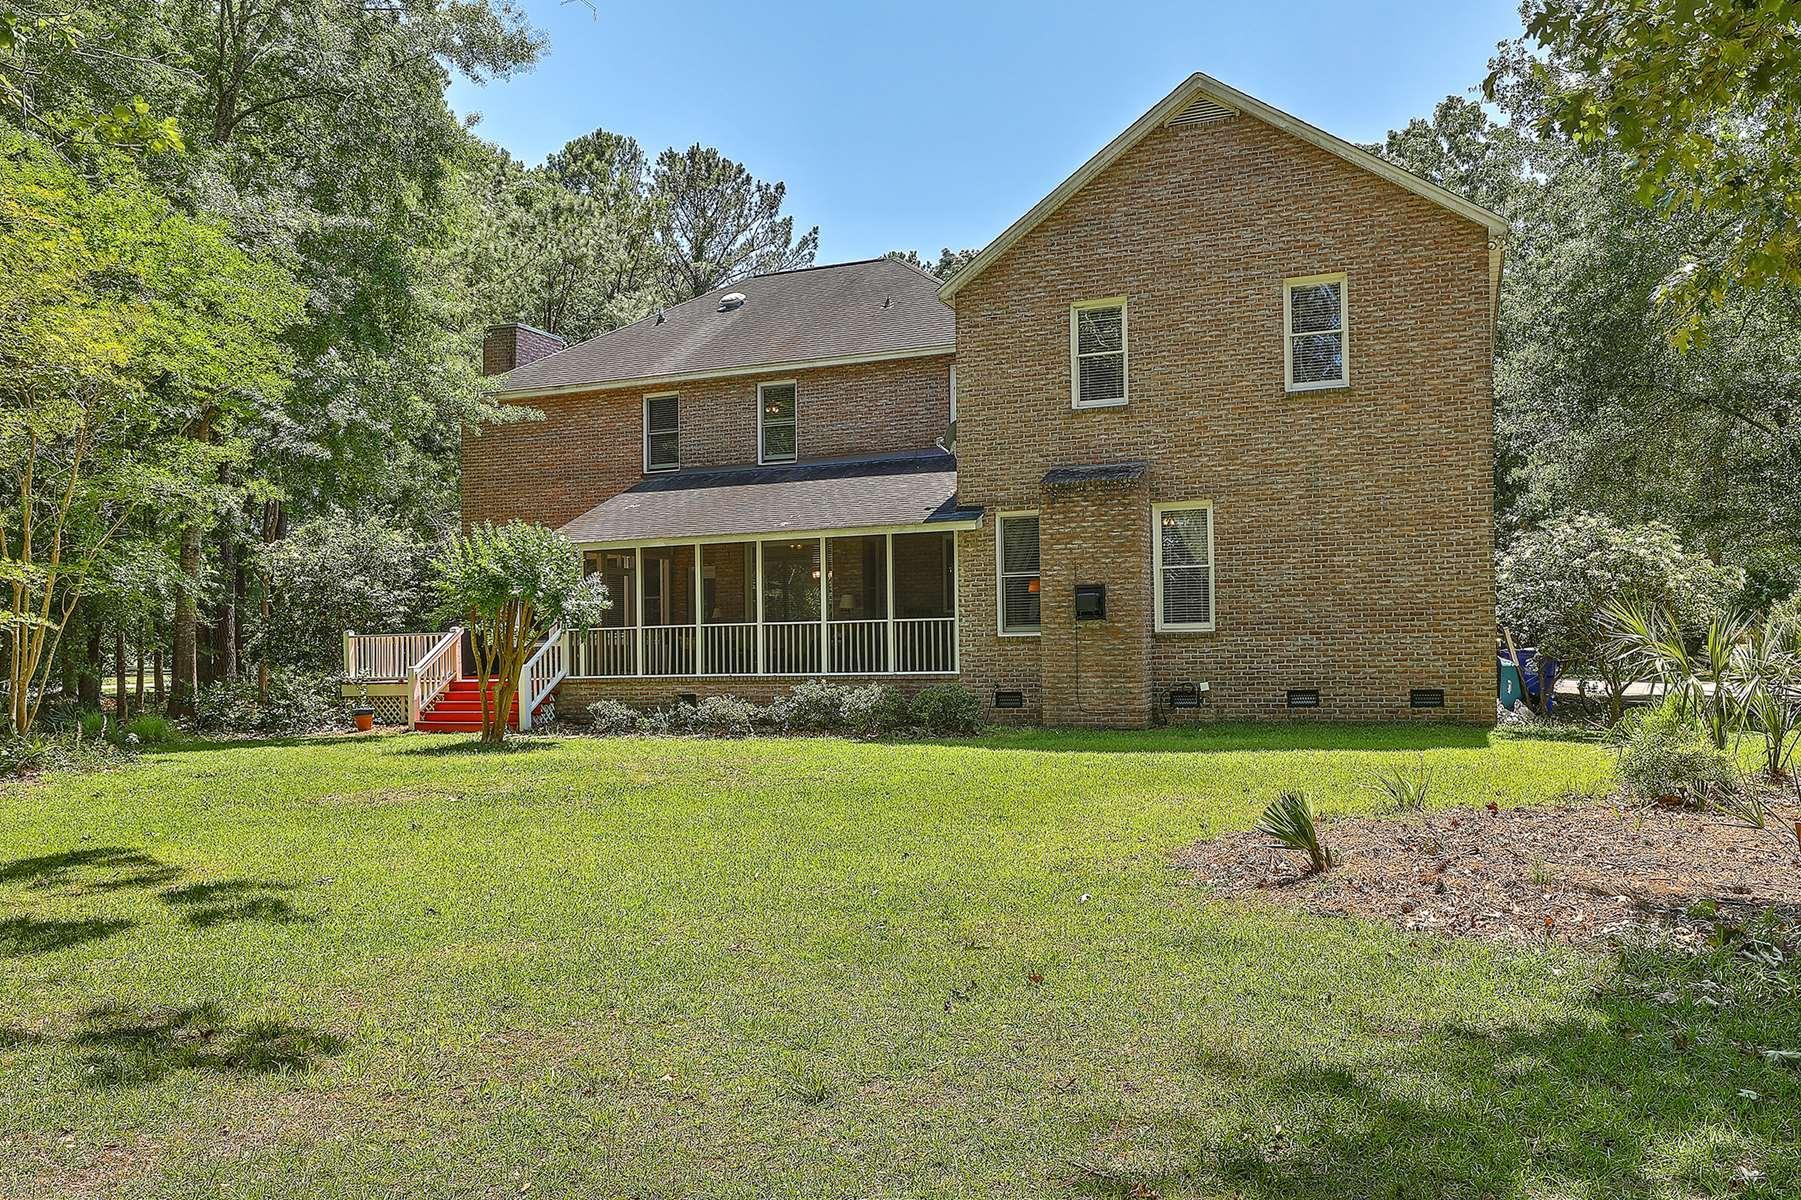 Dunes West Homes For Sale - 2961 Pignatelli, Mount Pleasant, SC - 27